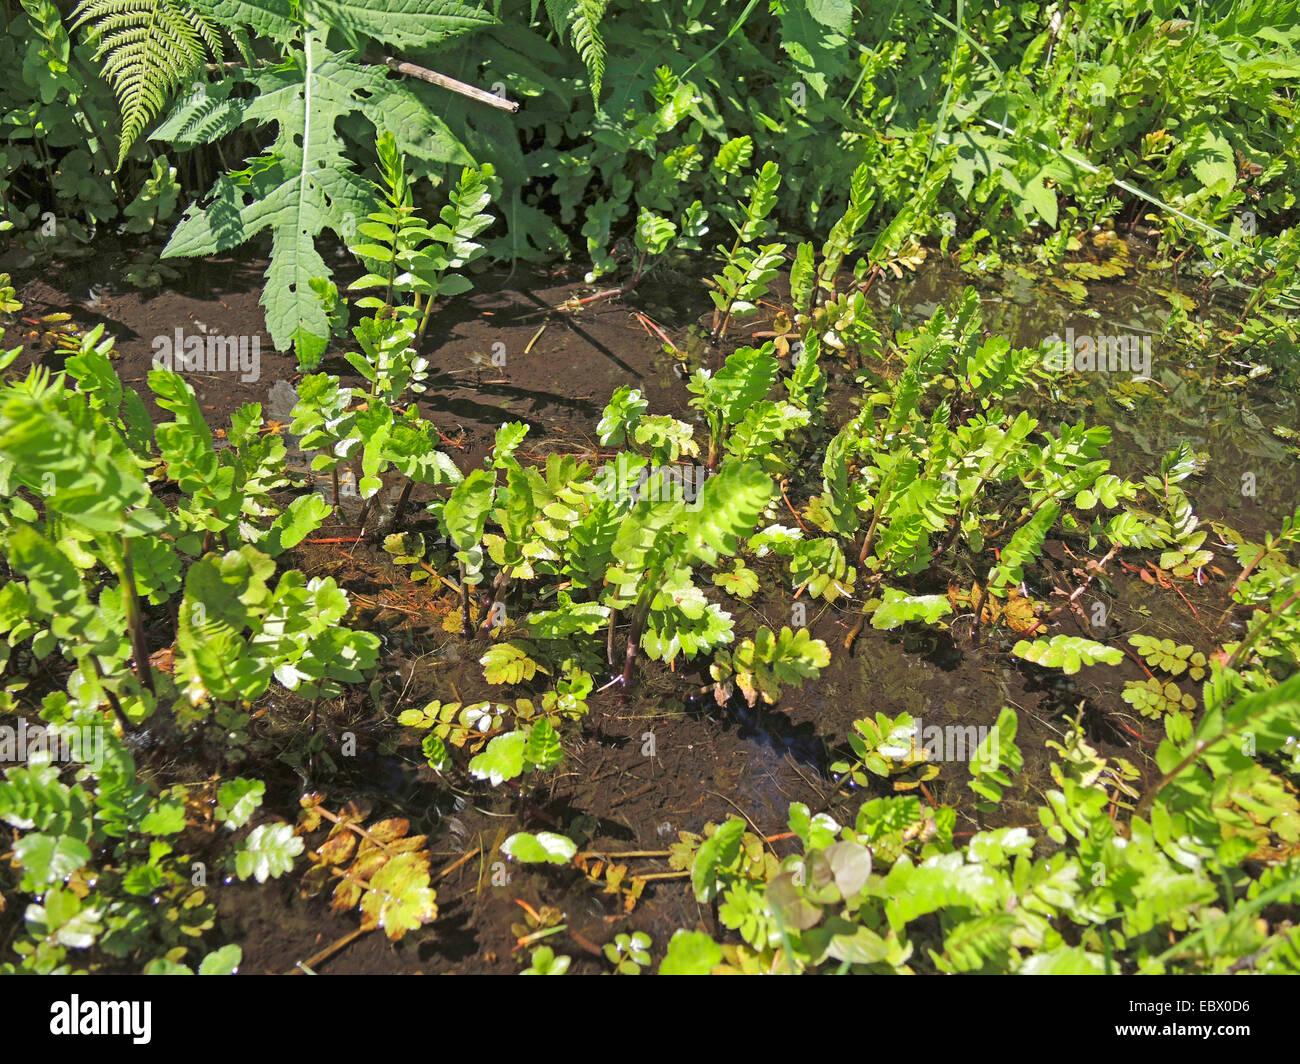 lesser water-parsnip, wild parsnip (Berula erecta), leaves in a ditch, Germany, North Rhine-Westphalia Stock Photo